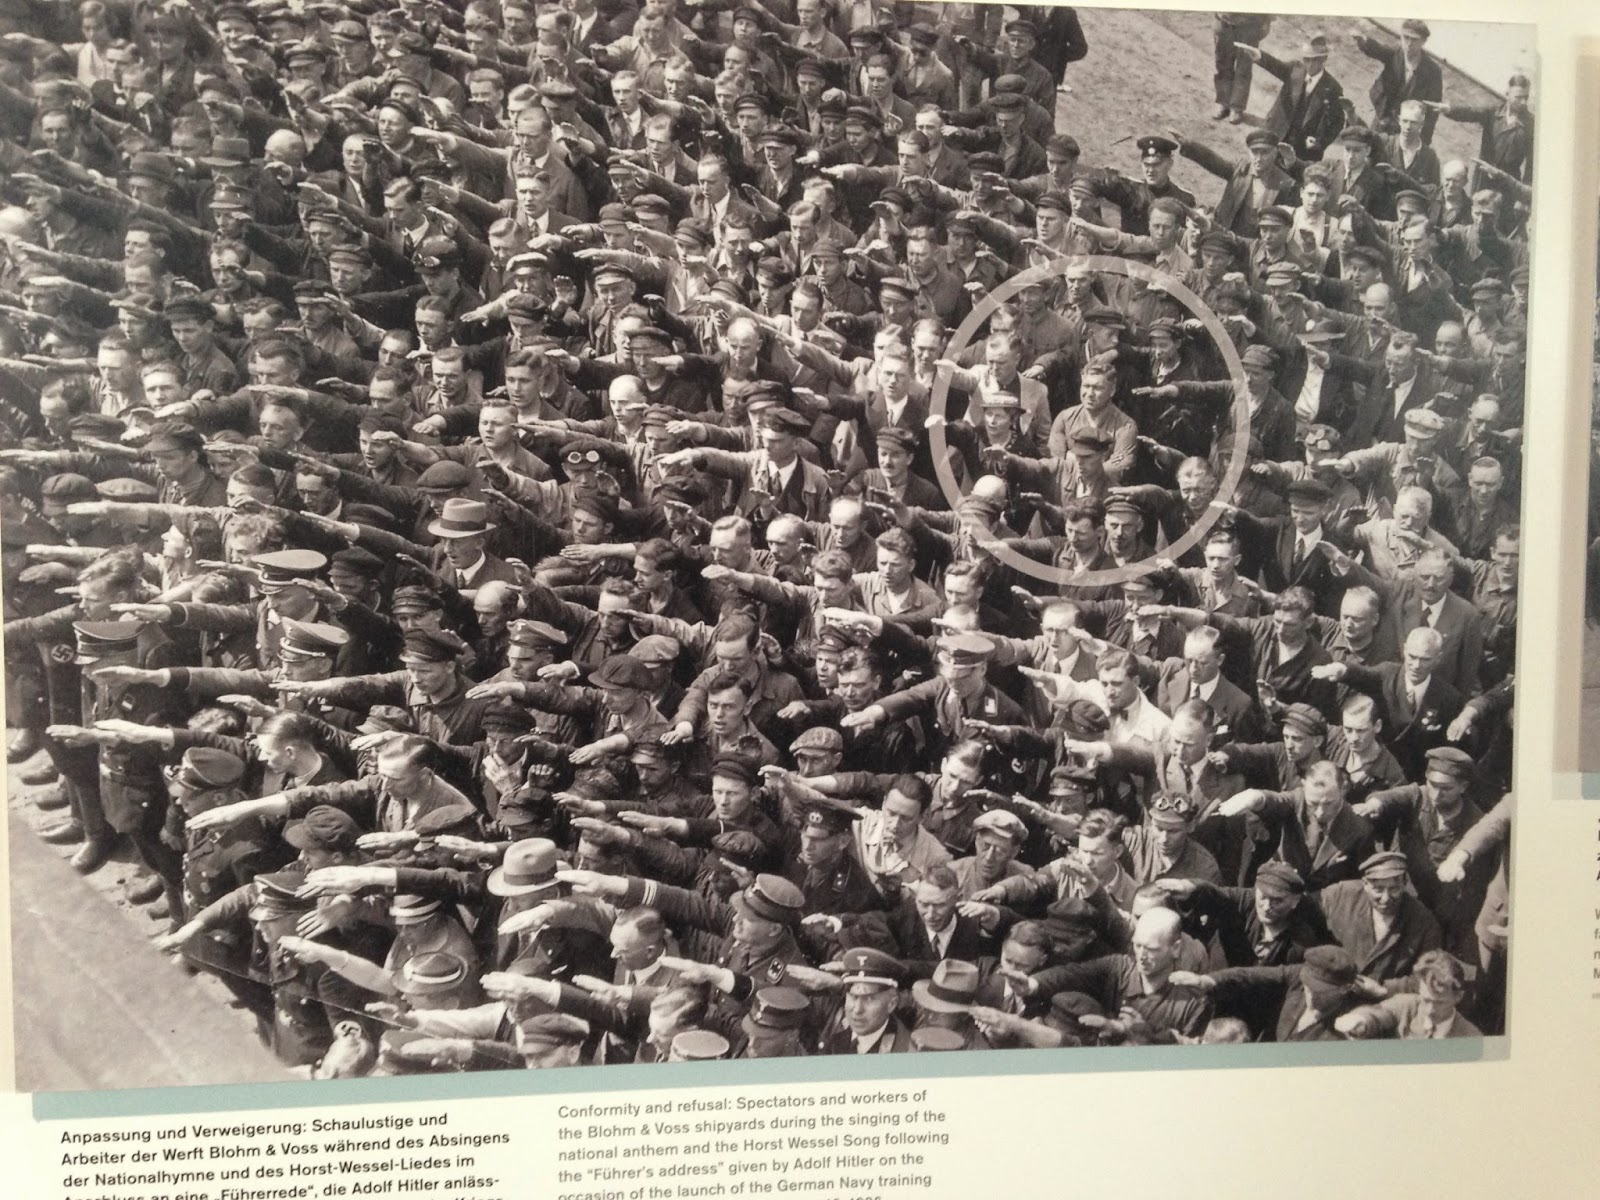 Berlin sa vaxte sig nazismen stark